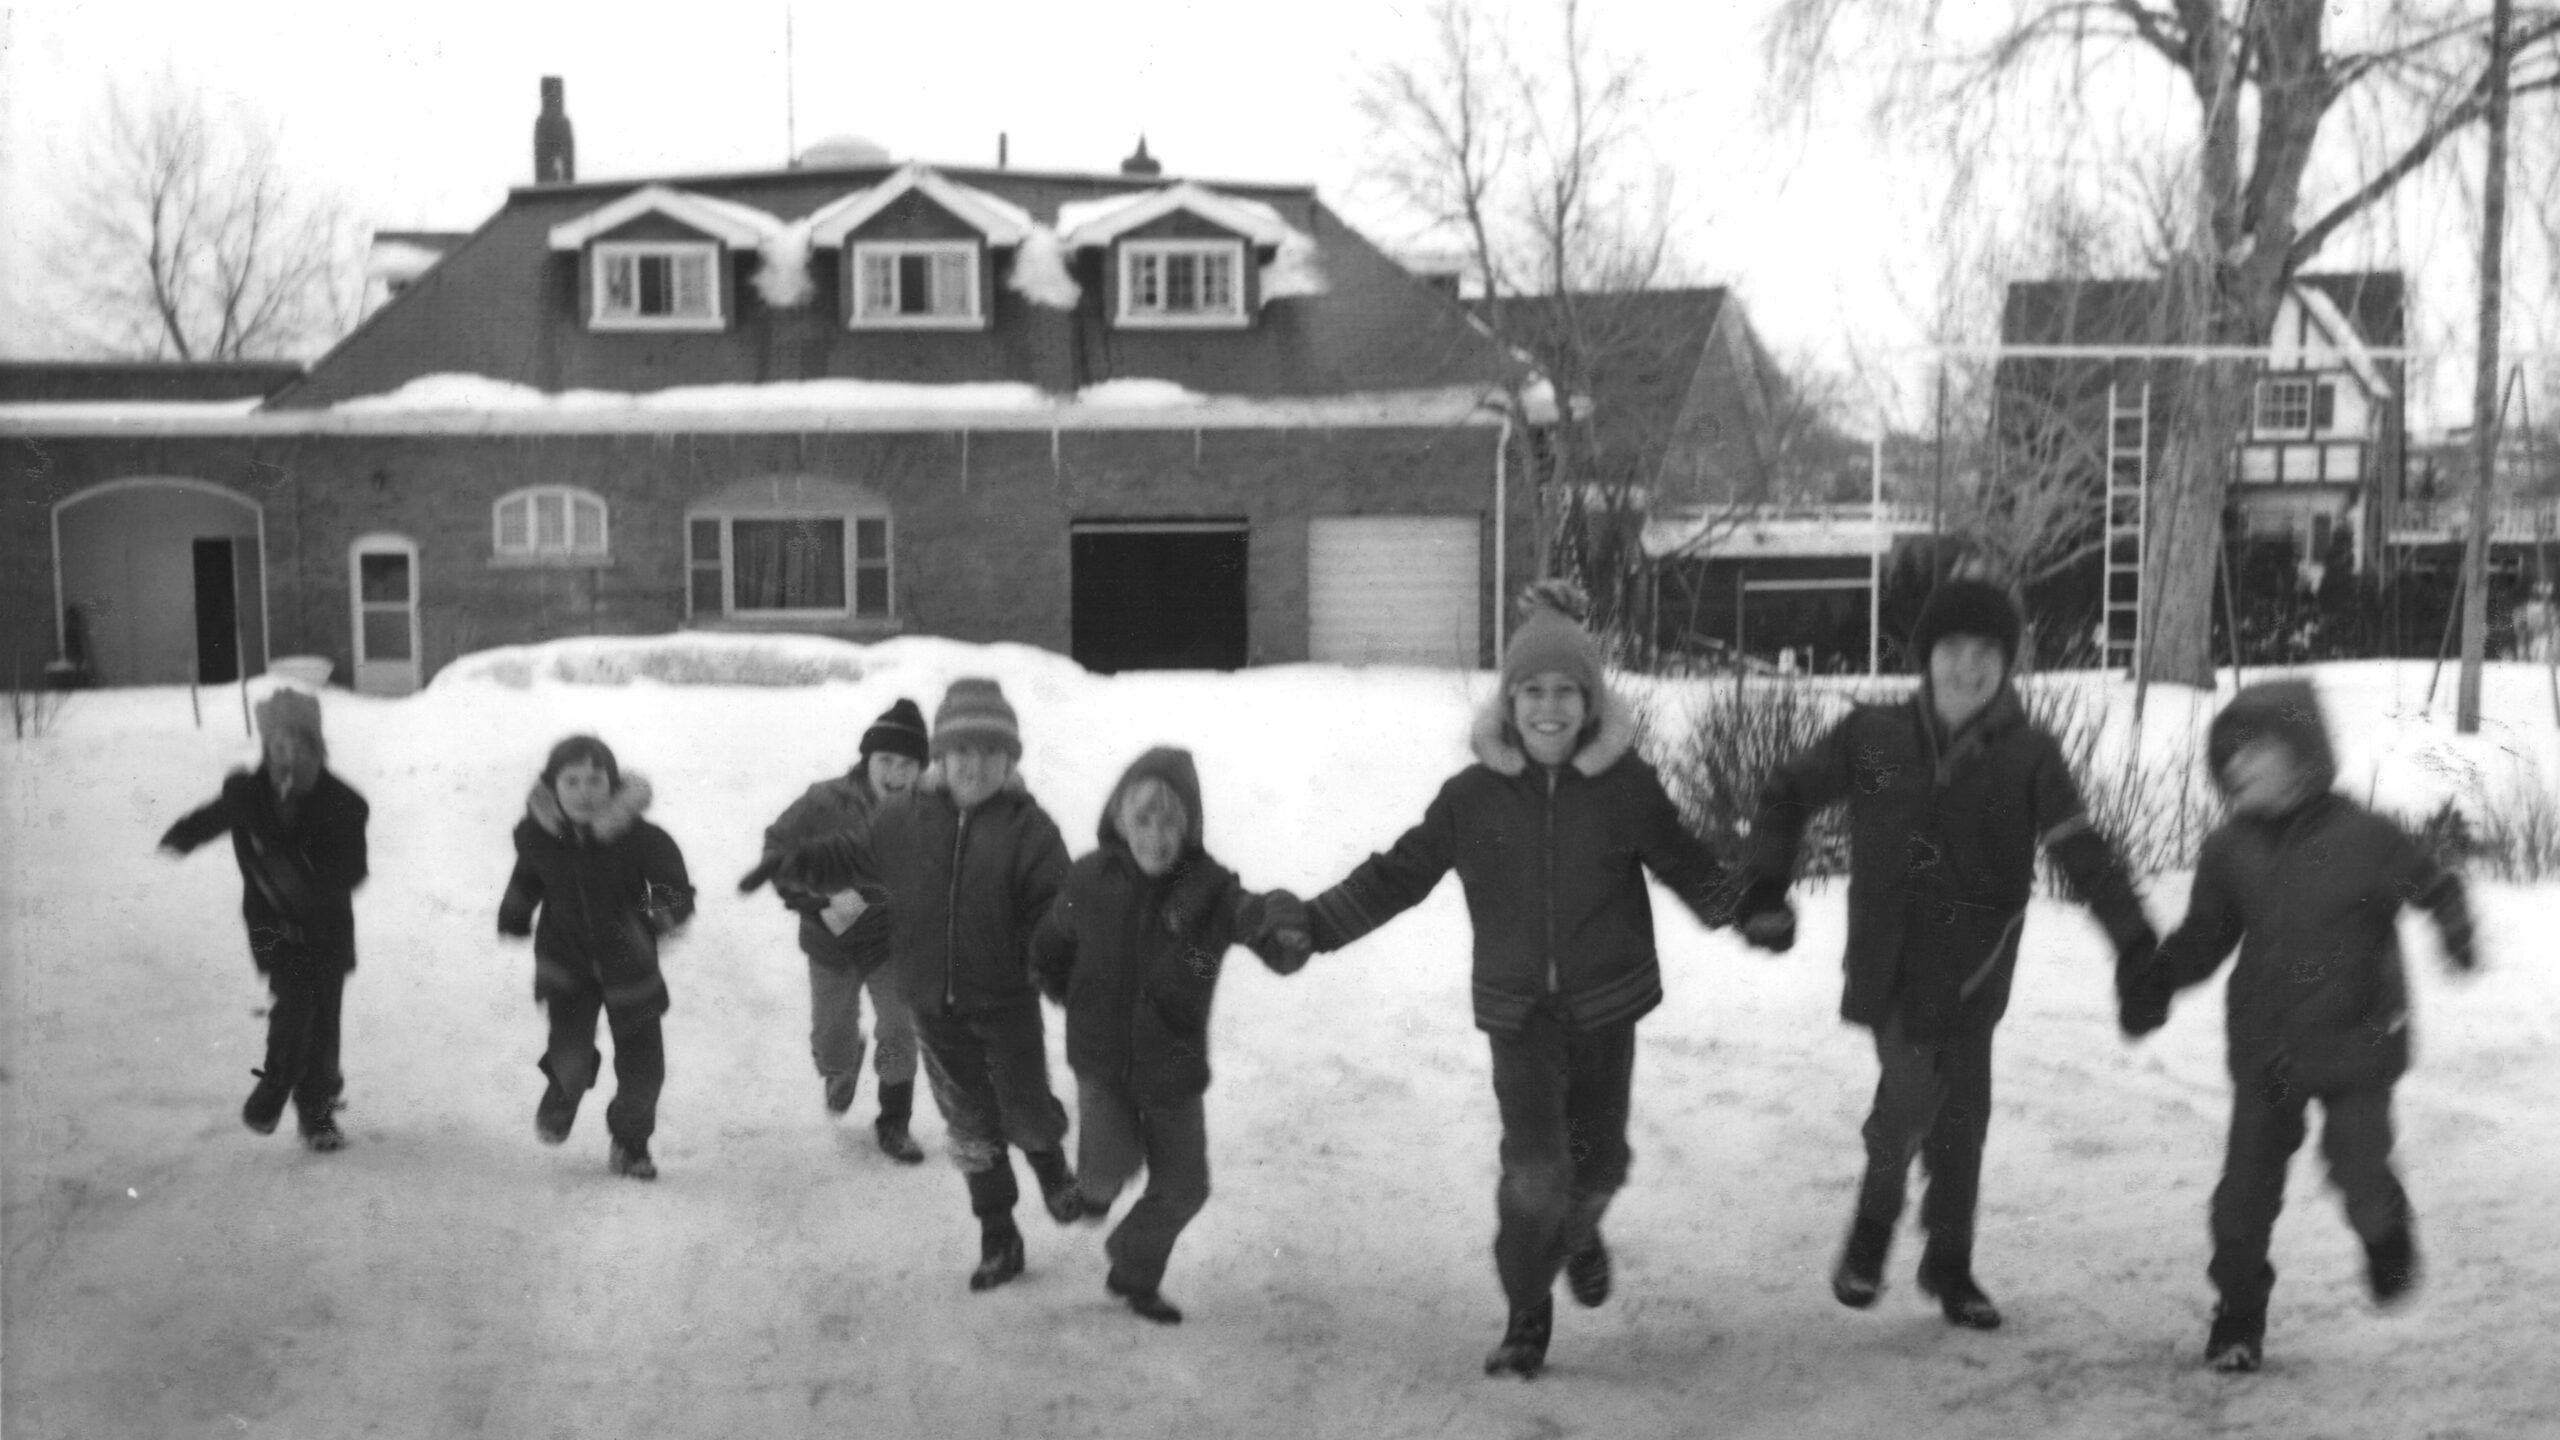 Children in front of Broadview Village Children's Home